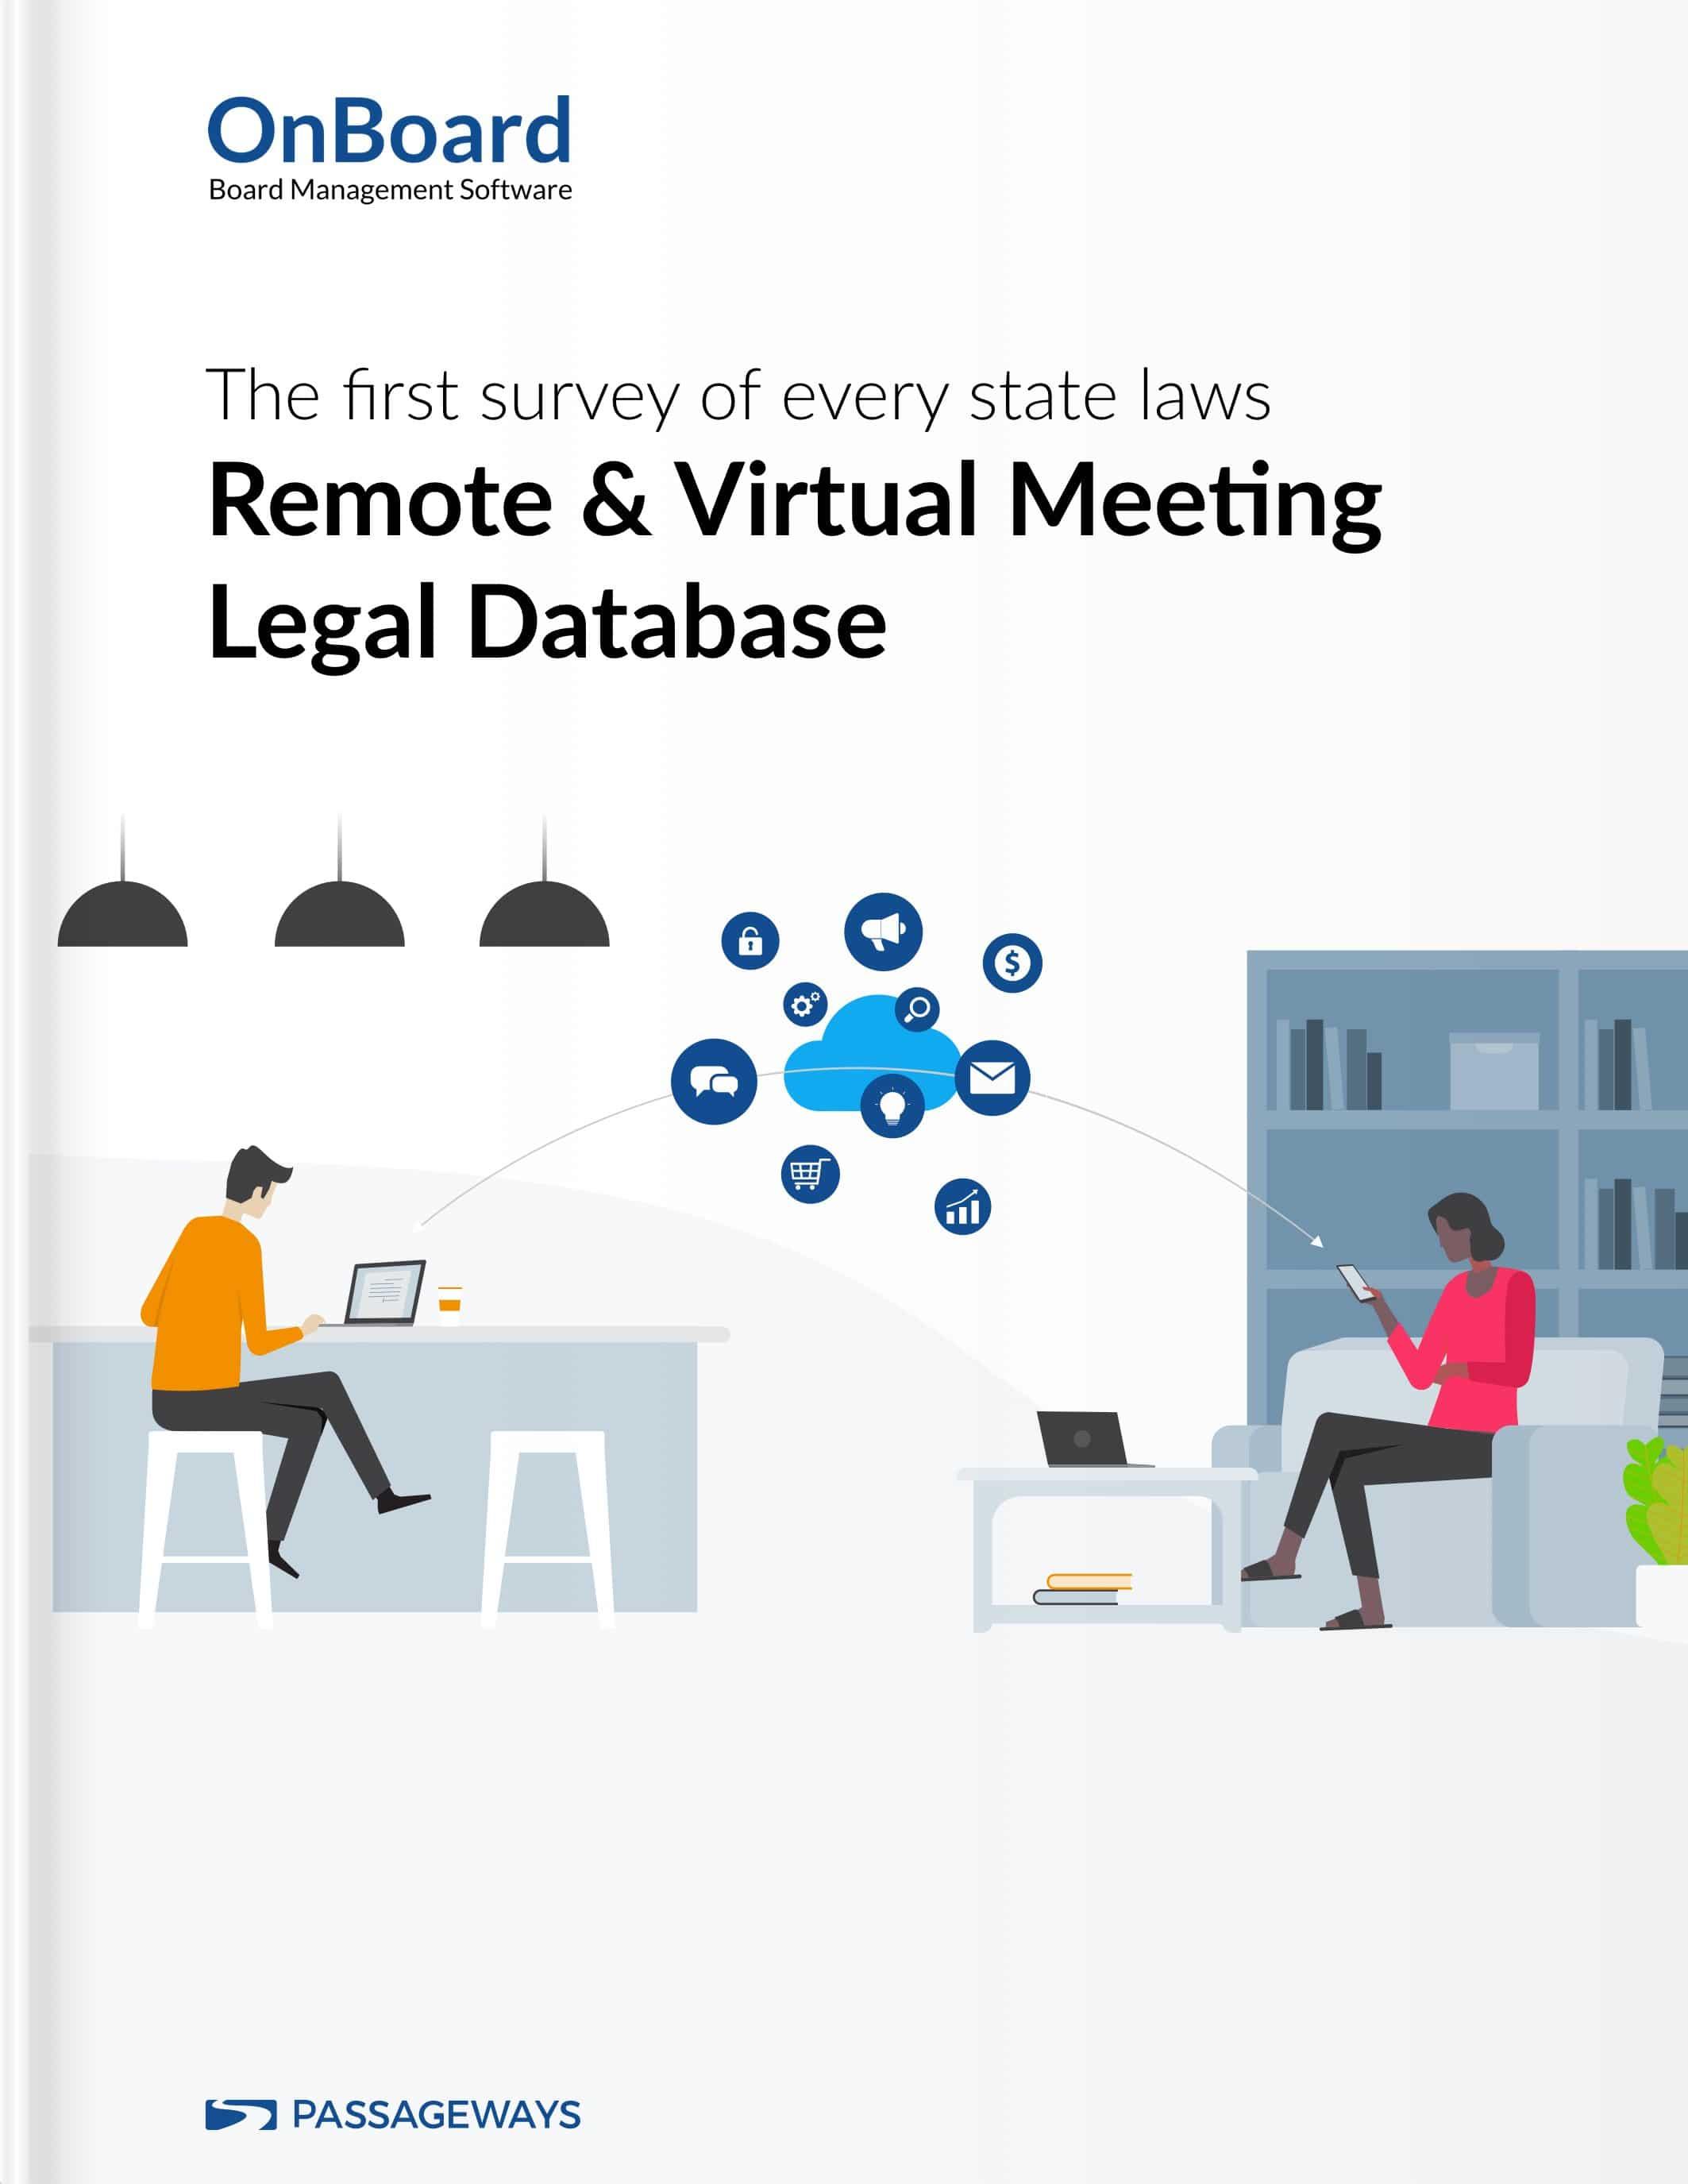 Remote & Virtual Meeting Legal Database